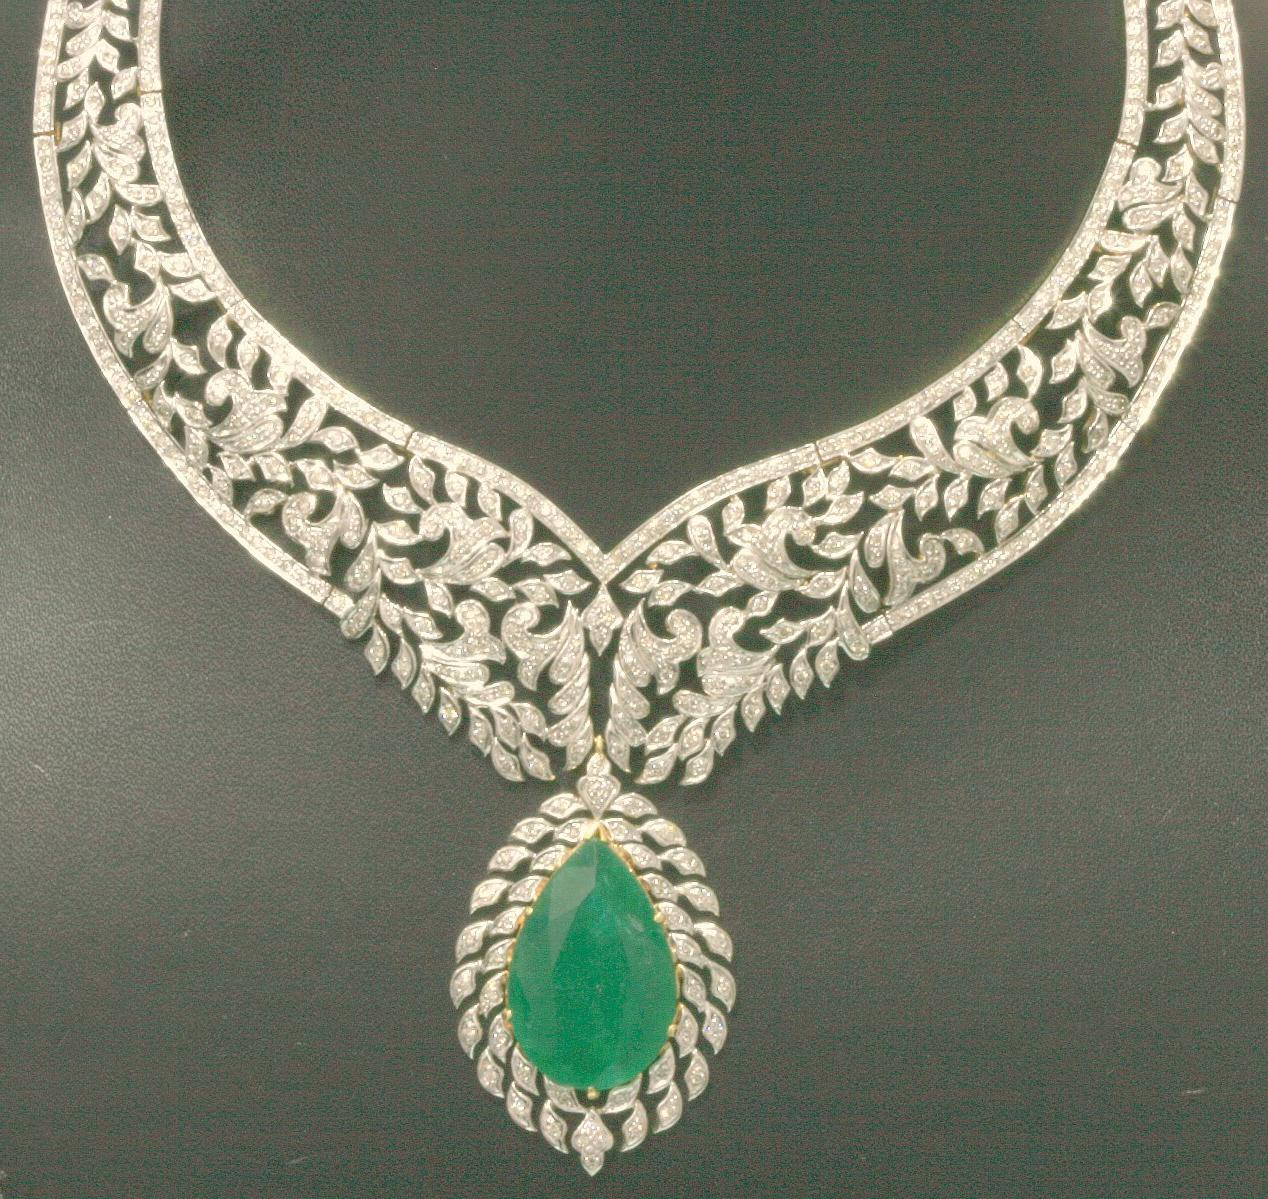 diamond engagement ring to